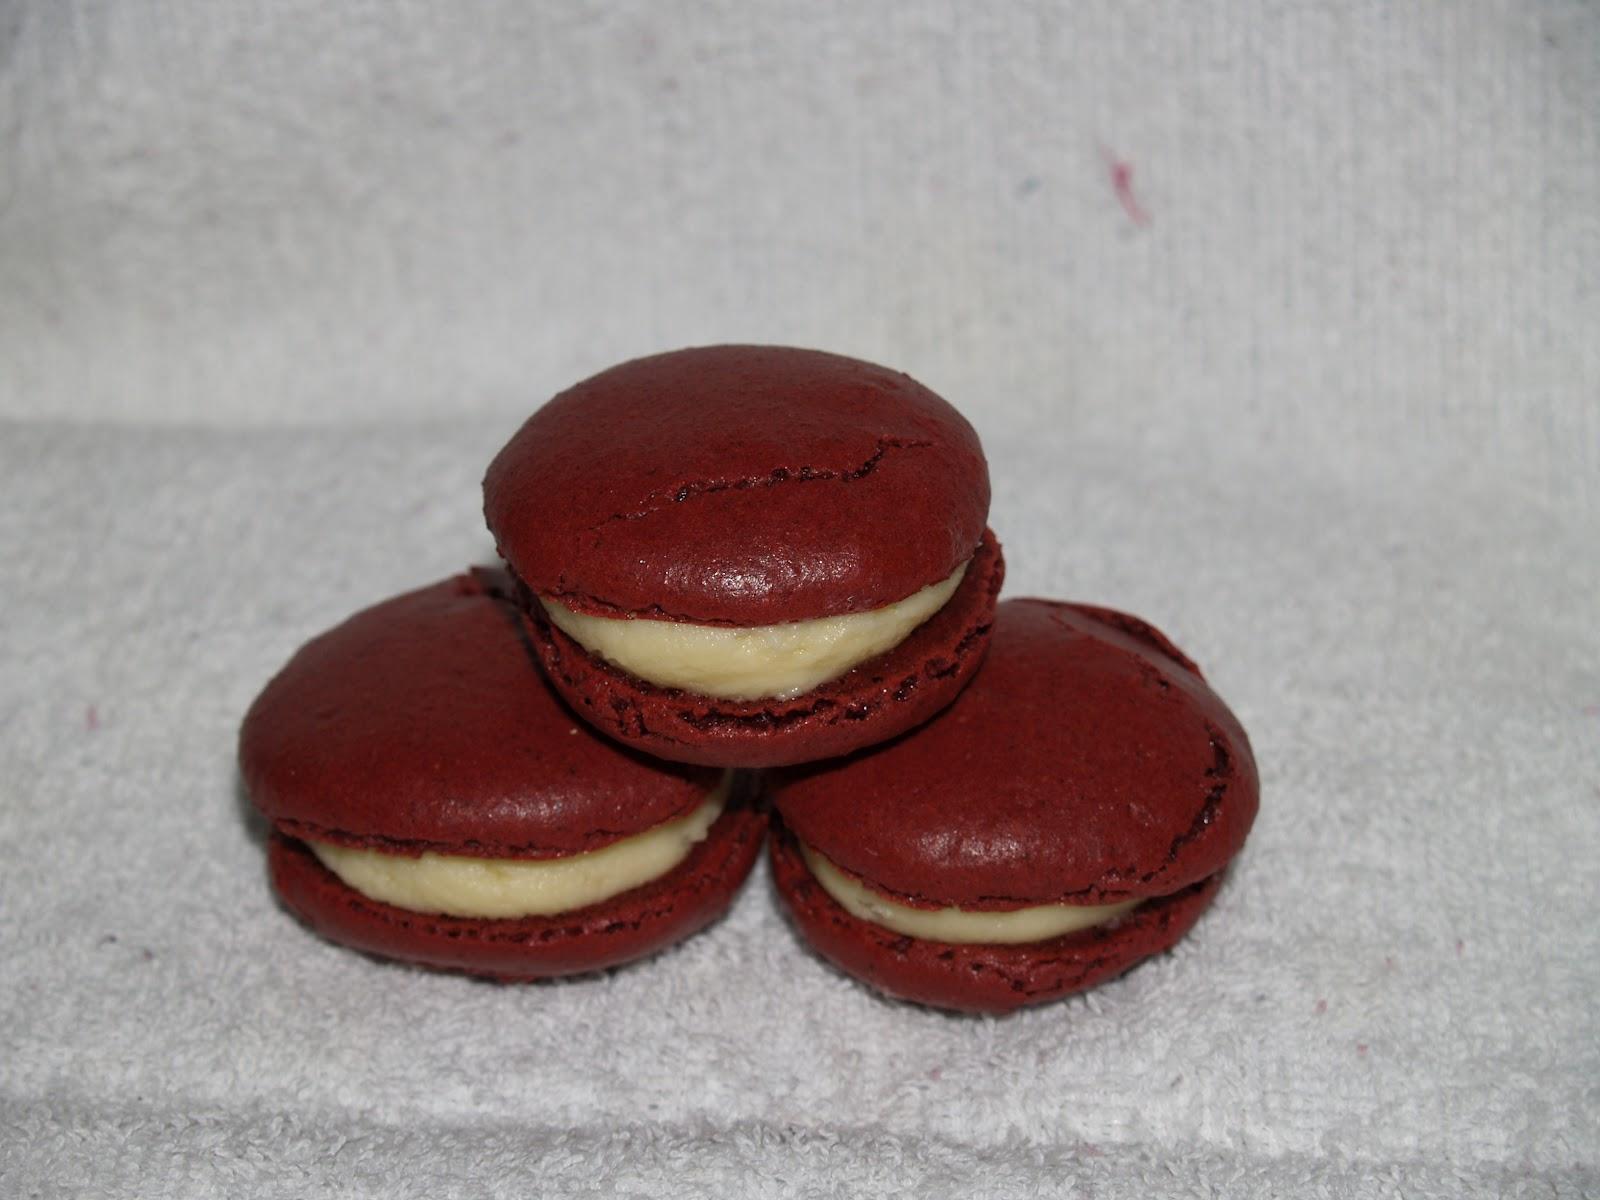 The Mad Hatters Baking Red Velvet Macarons